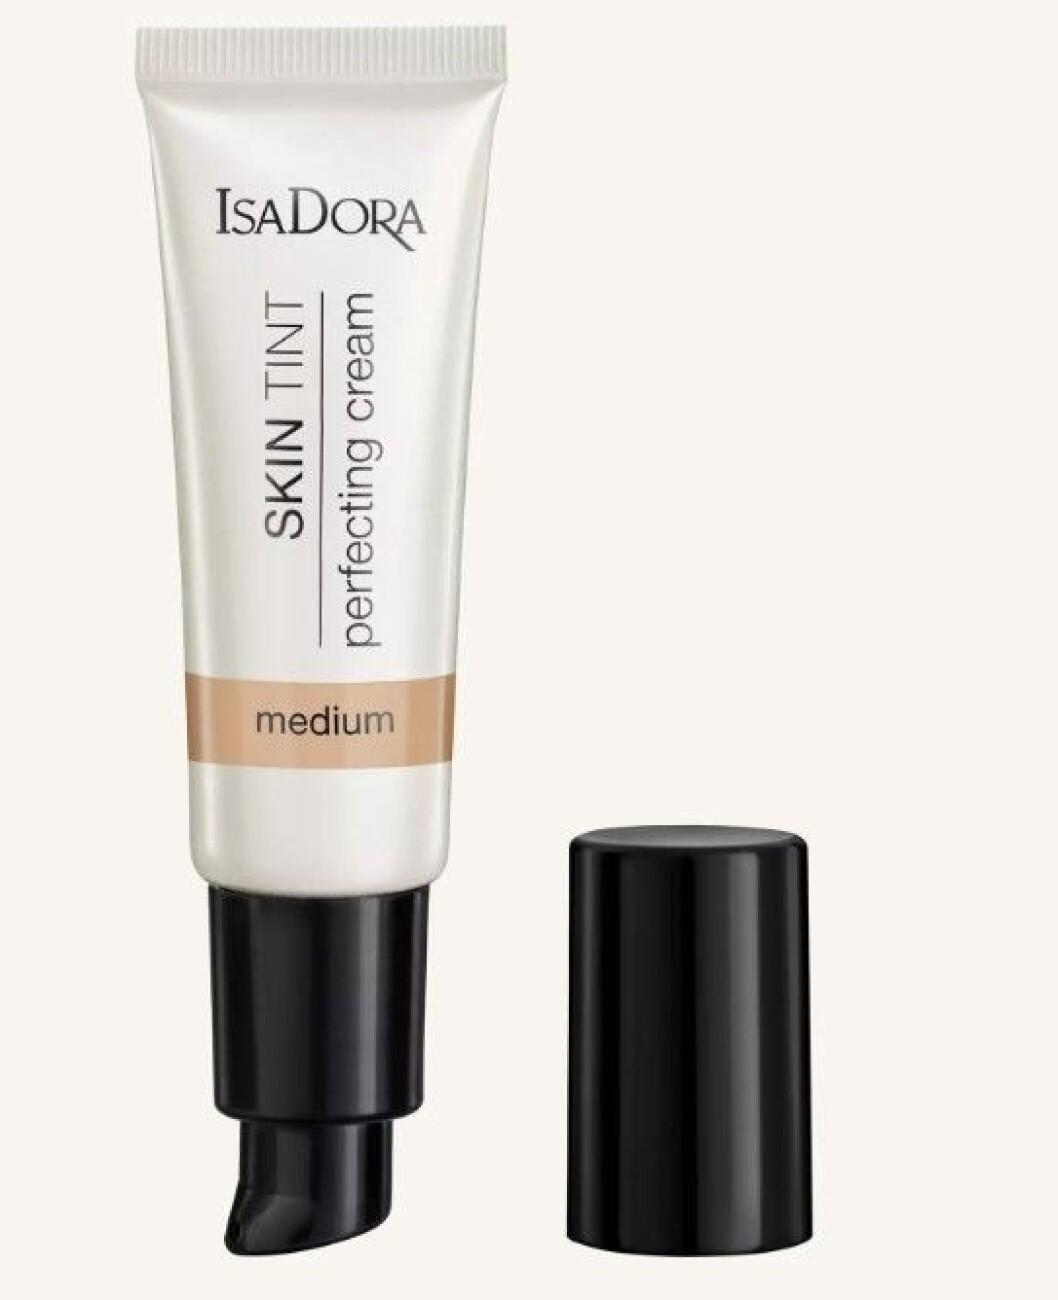 isadora skin tint foundation